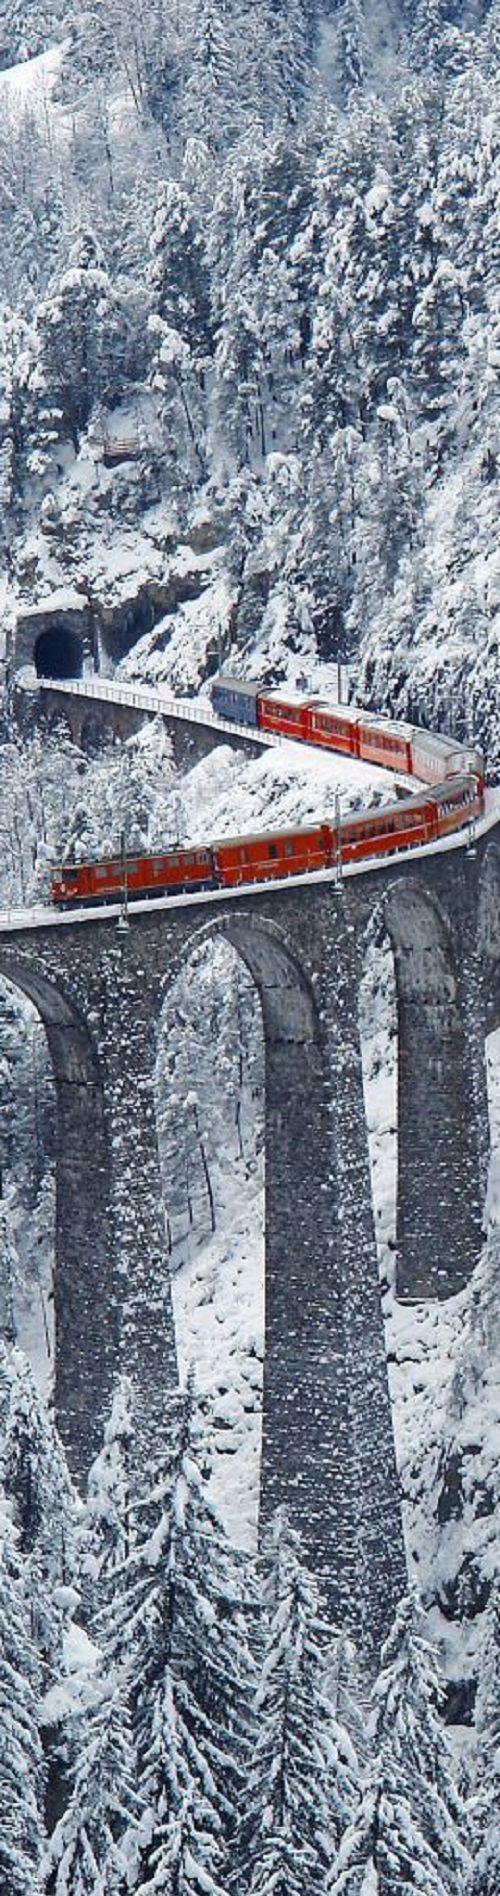 #winterwedding #honeymoon #Graubunden #Switzerland #pinetrees #train #European #romantic